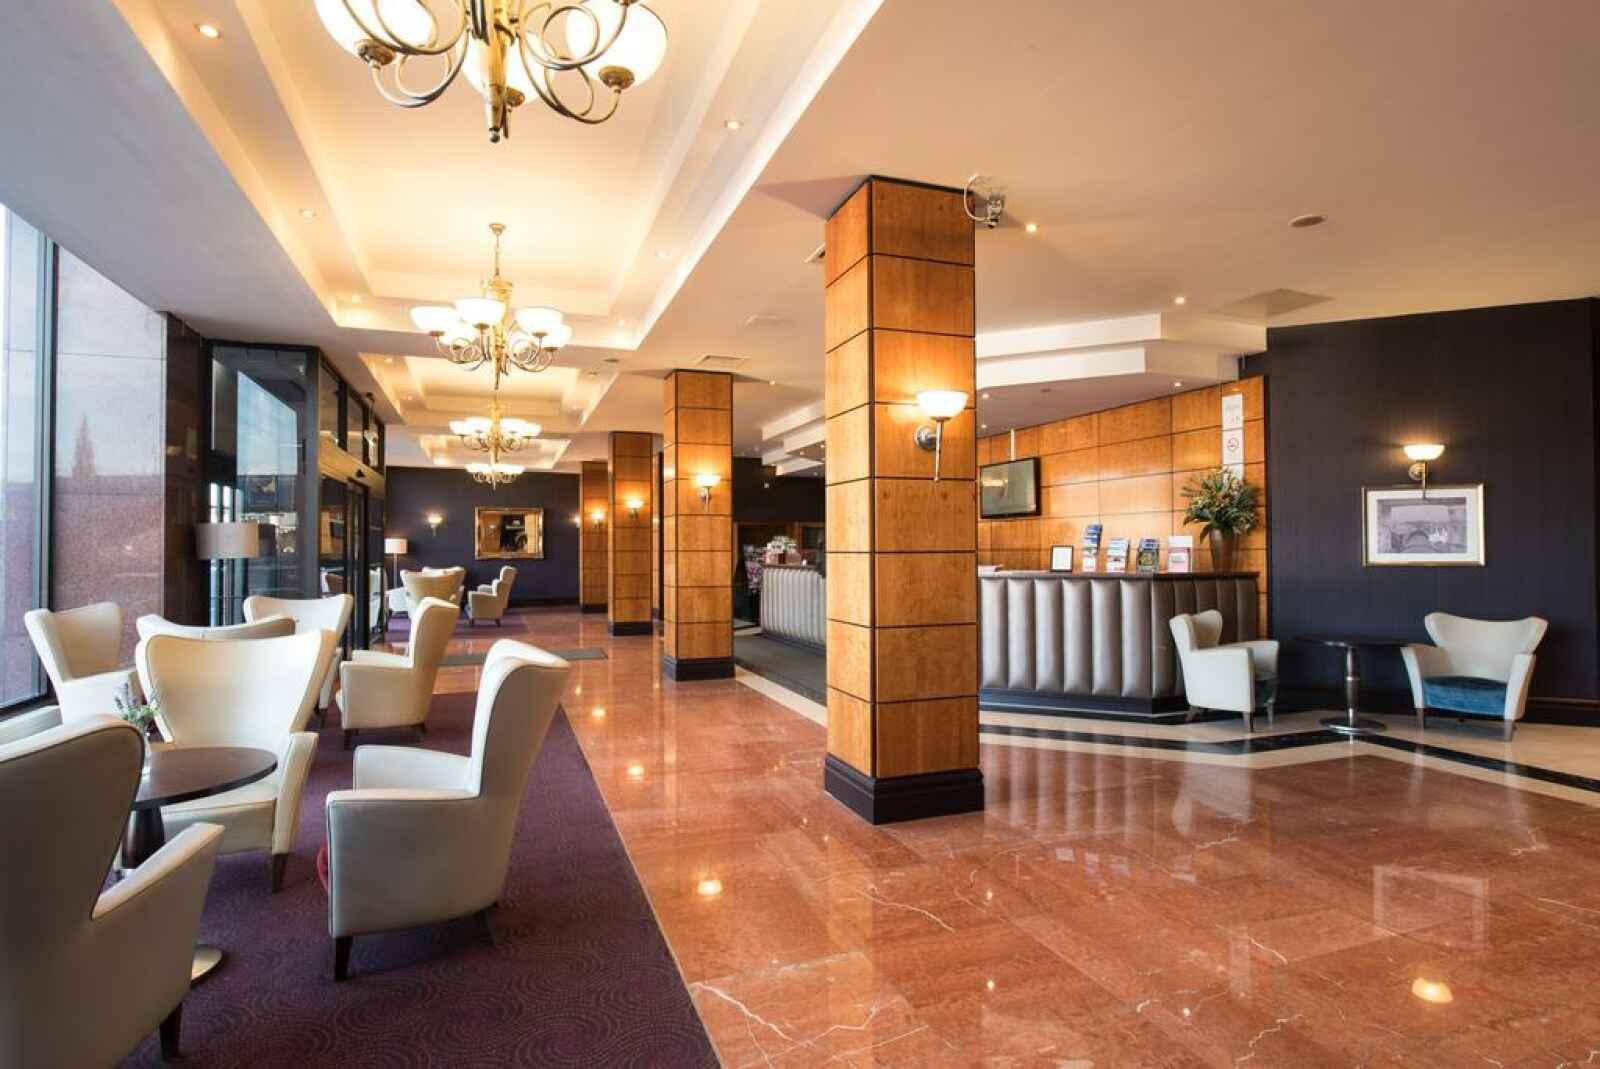 Ecosse - Grande-Bretagne - Edimbourg - Royaume Uni - Hôtel Jury's Inn Edimbourg